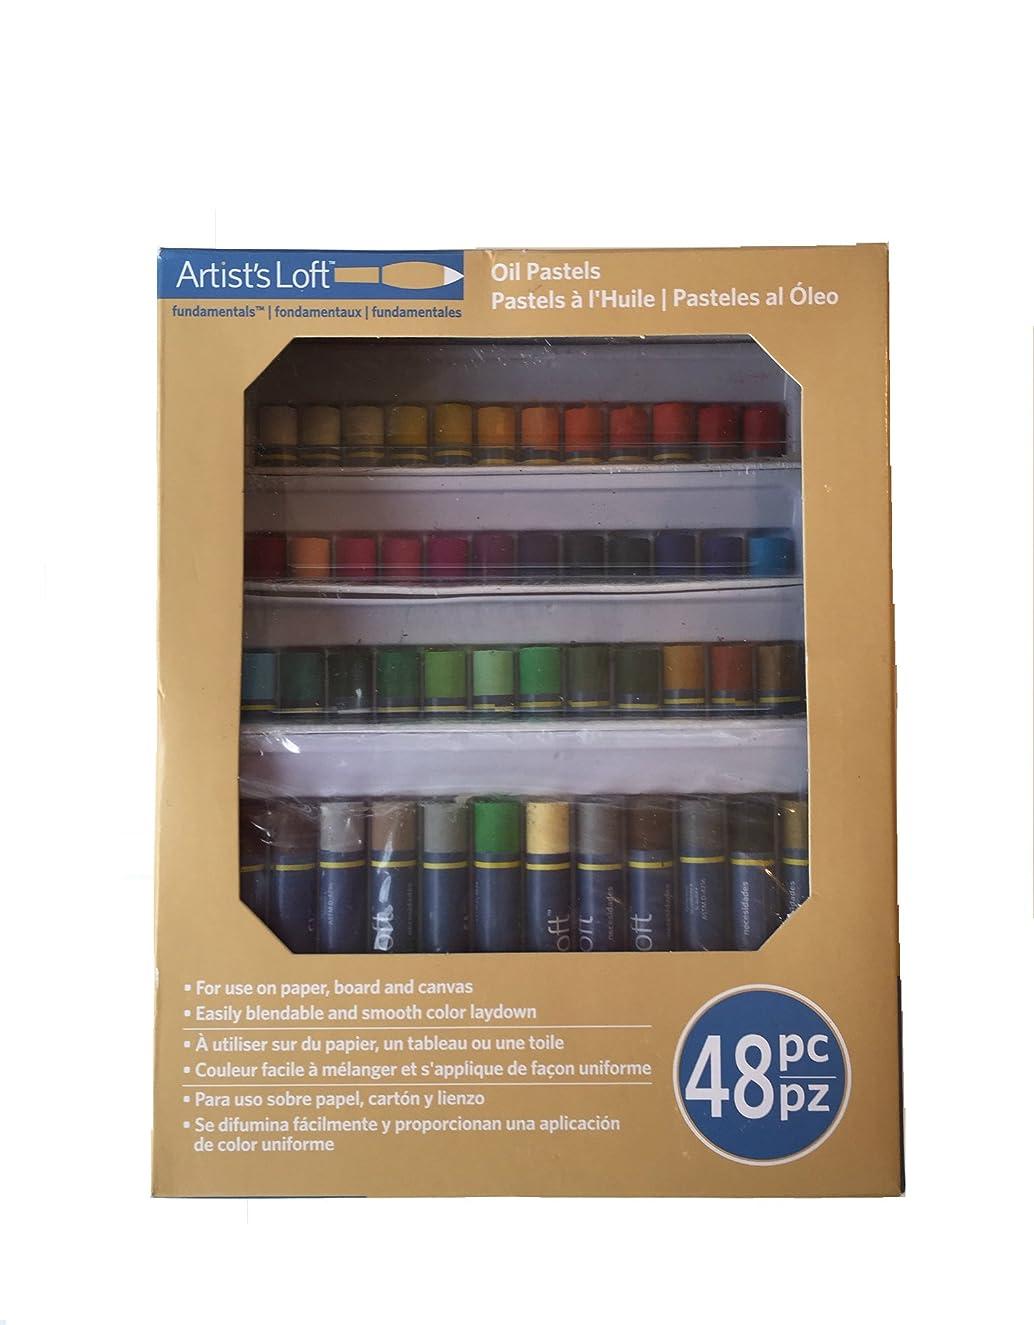 Artist's Loft Fundamentals Oil Pastels 48pc